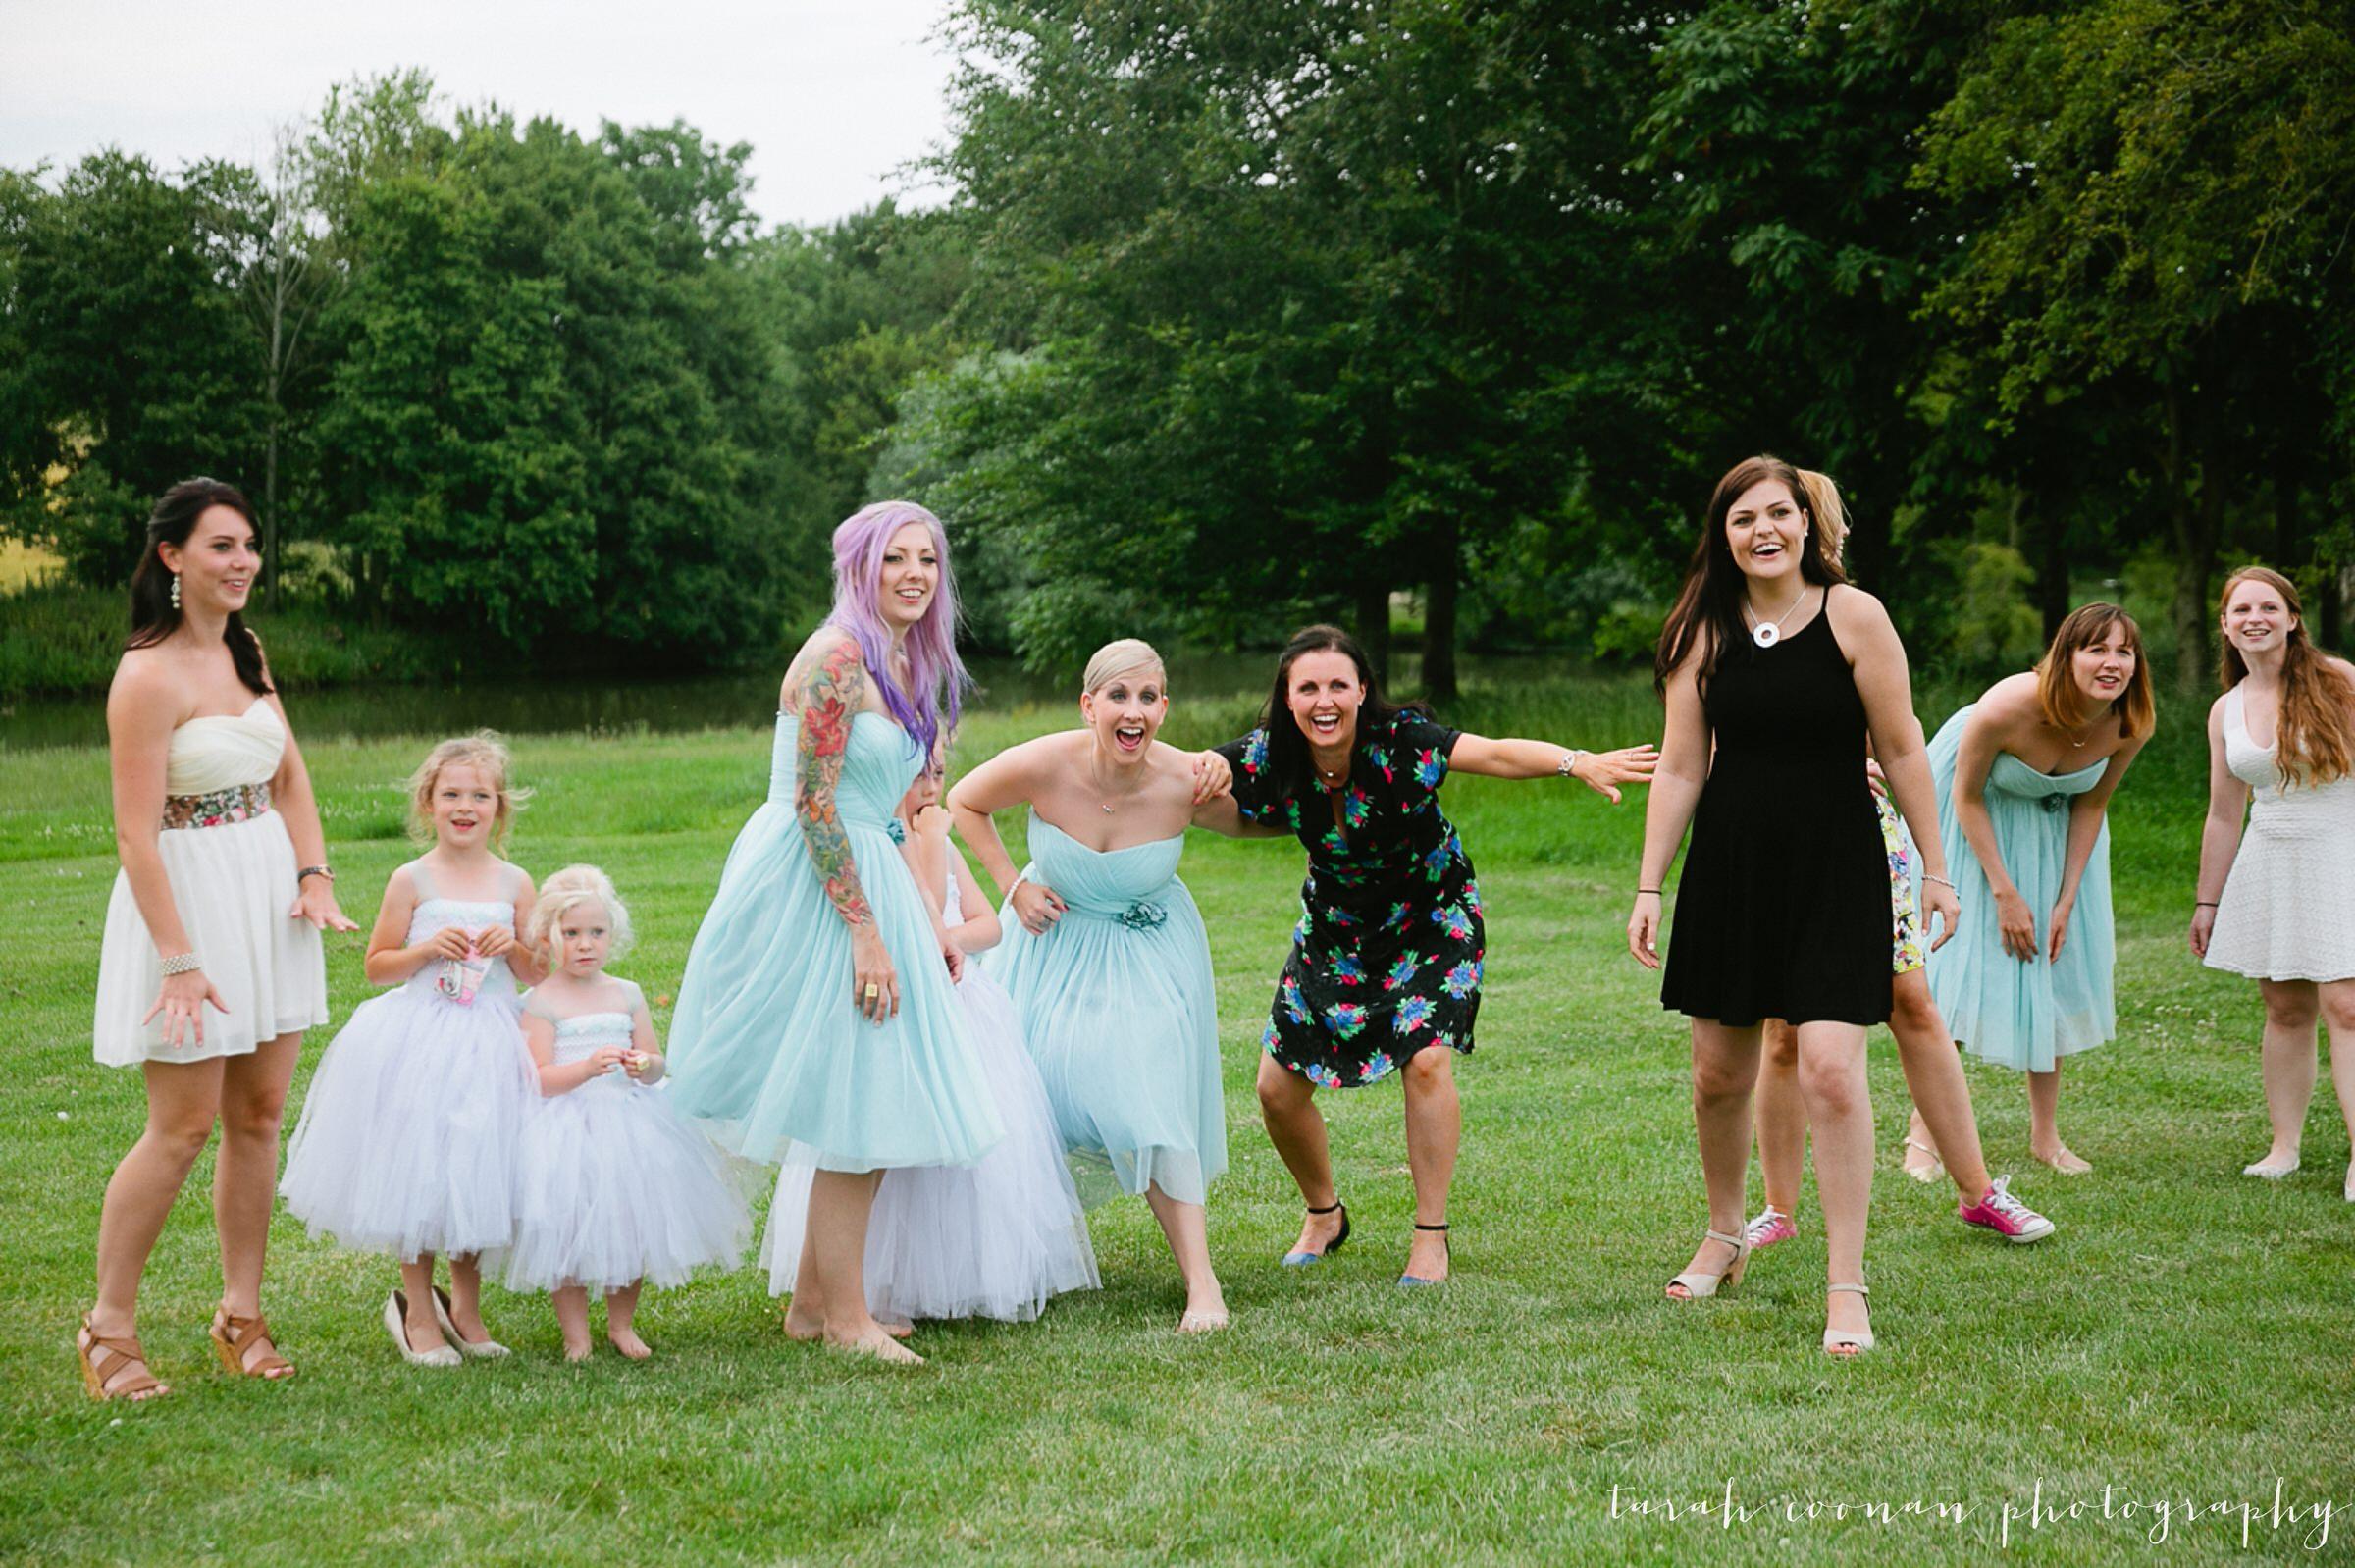 brighton-wedding-photographer53